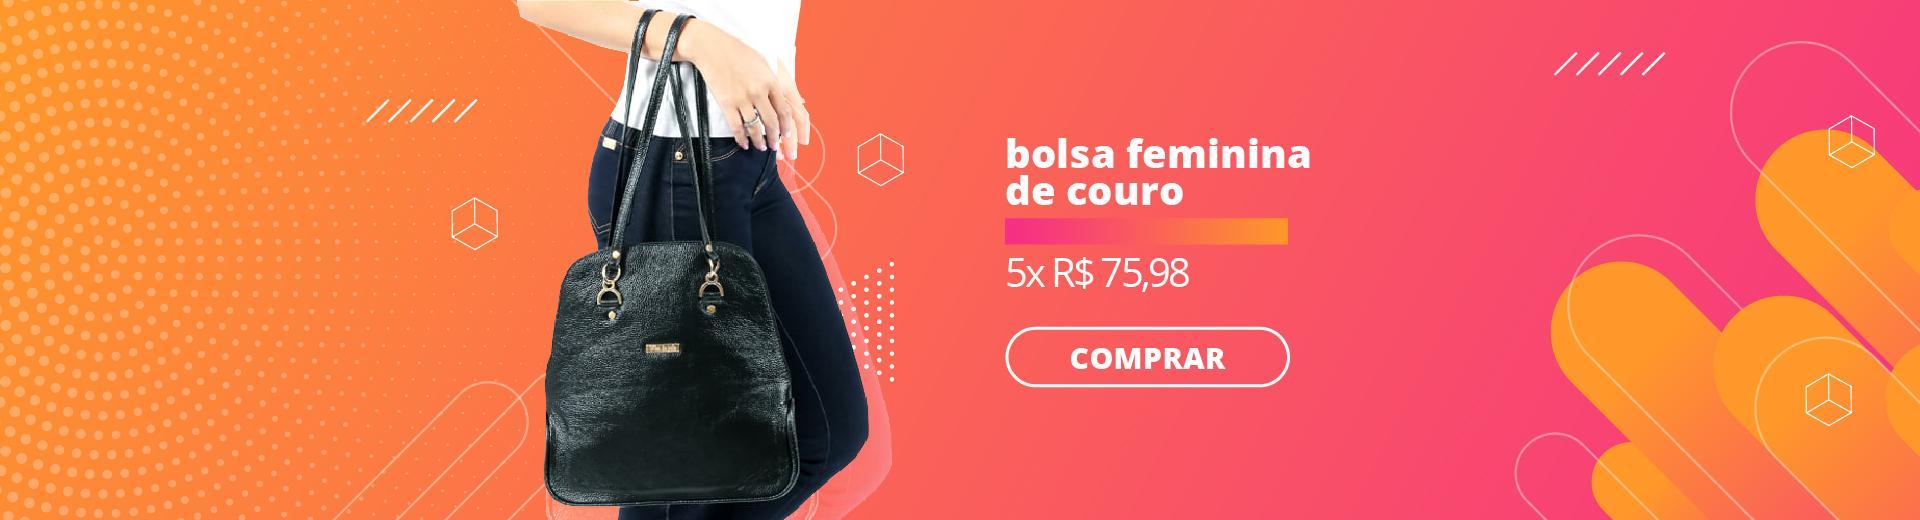 BOLSA FEMININA DE COURO PRETA